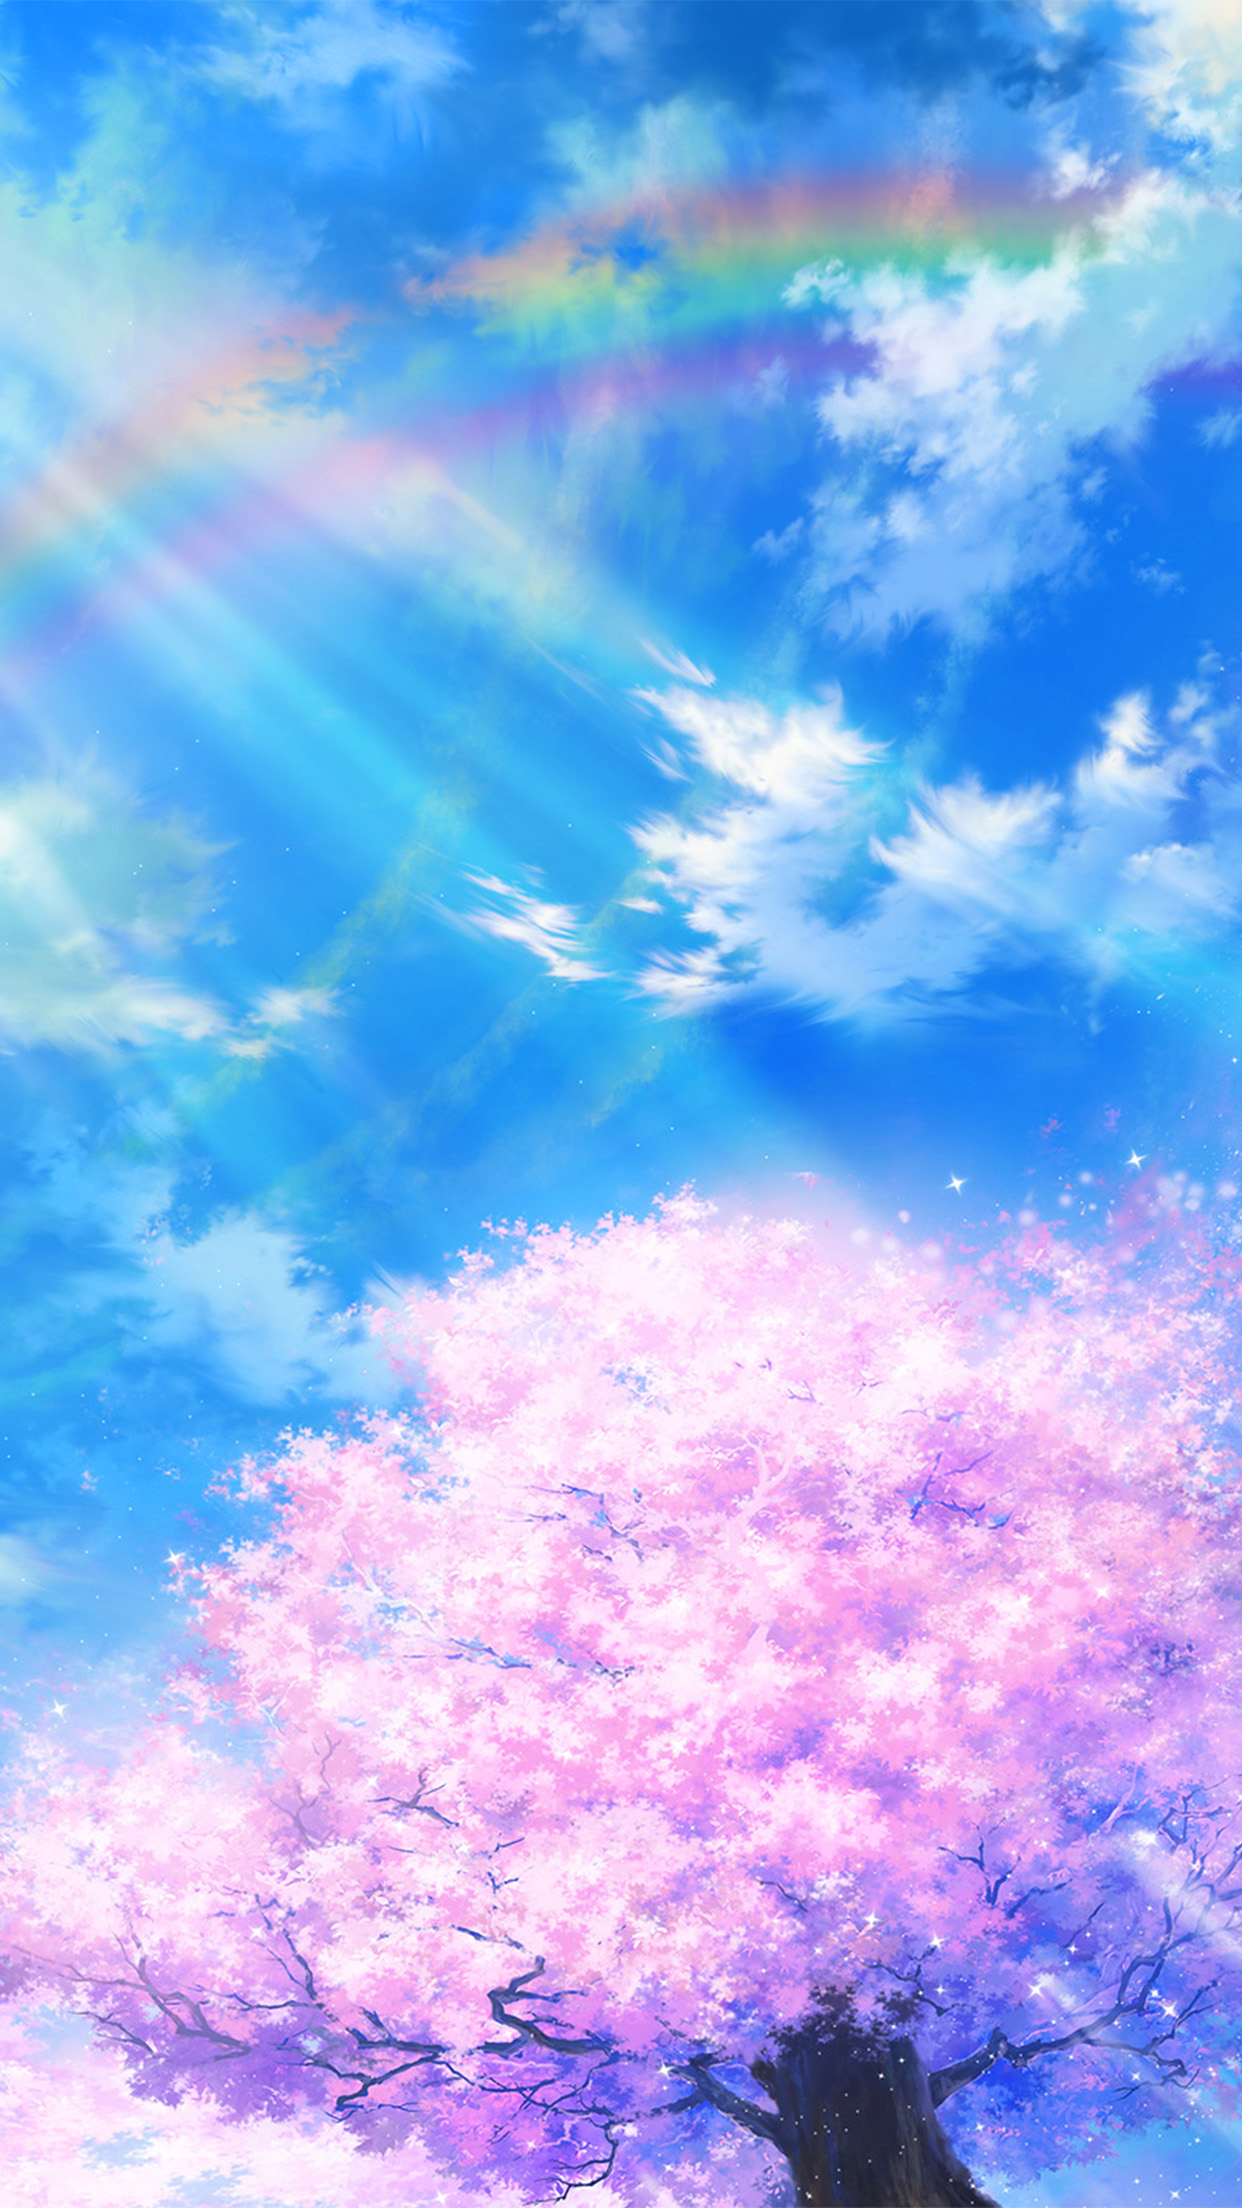 bd75-anime-sky-cloud-spring-art-illustration-wallpaper